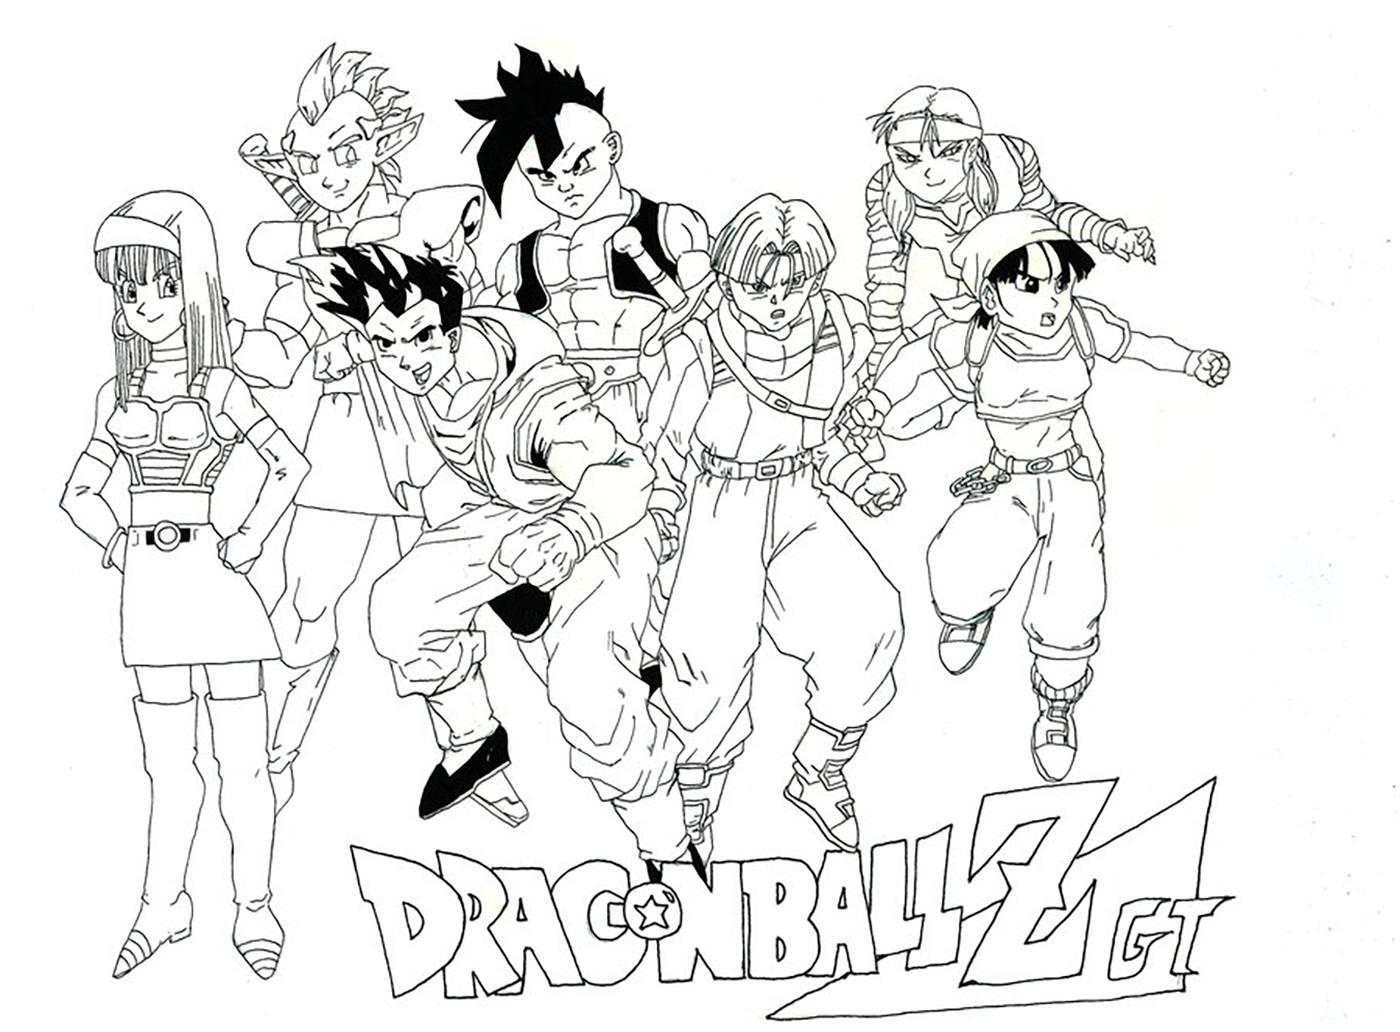 Oob Bulma Trunks Yamcha Videl And Warriors Dragon Ball Z Kids